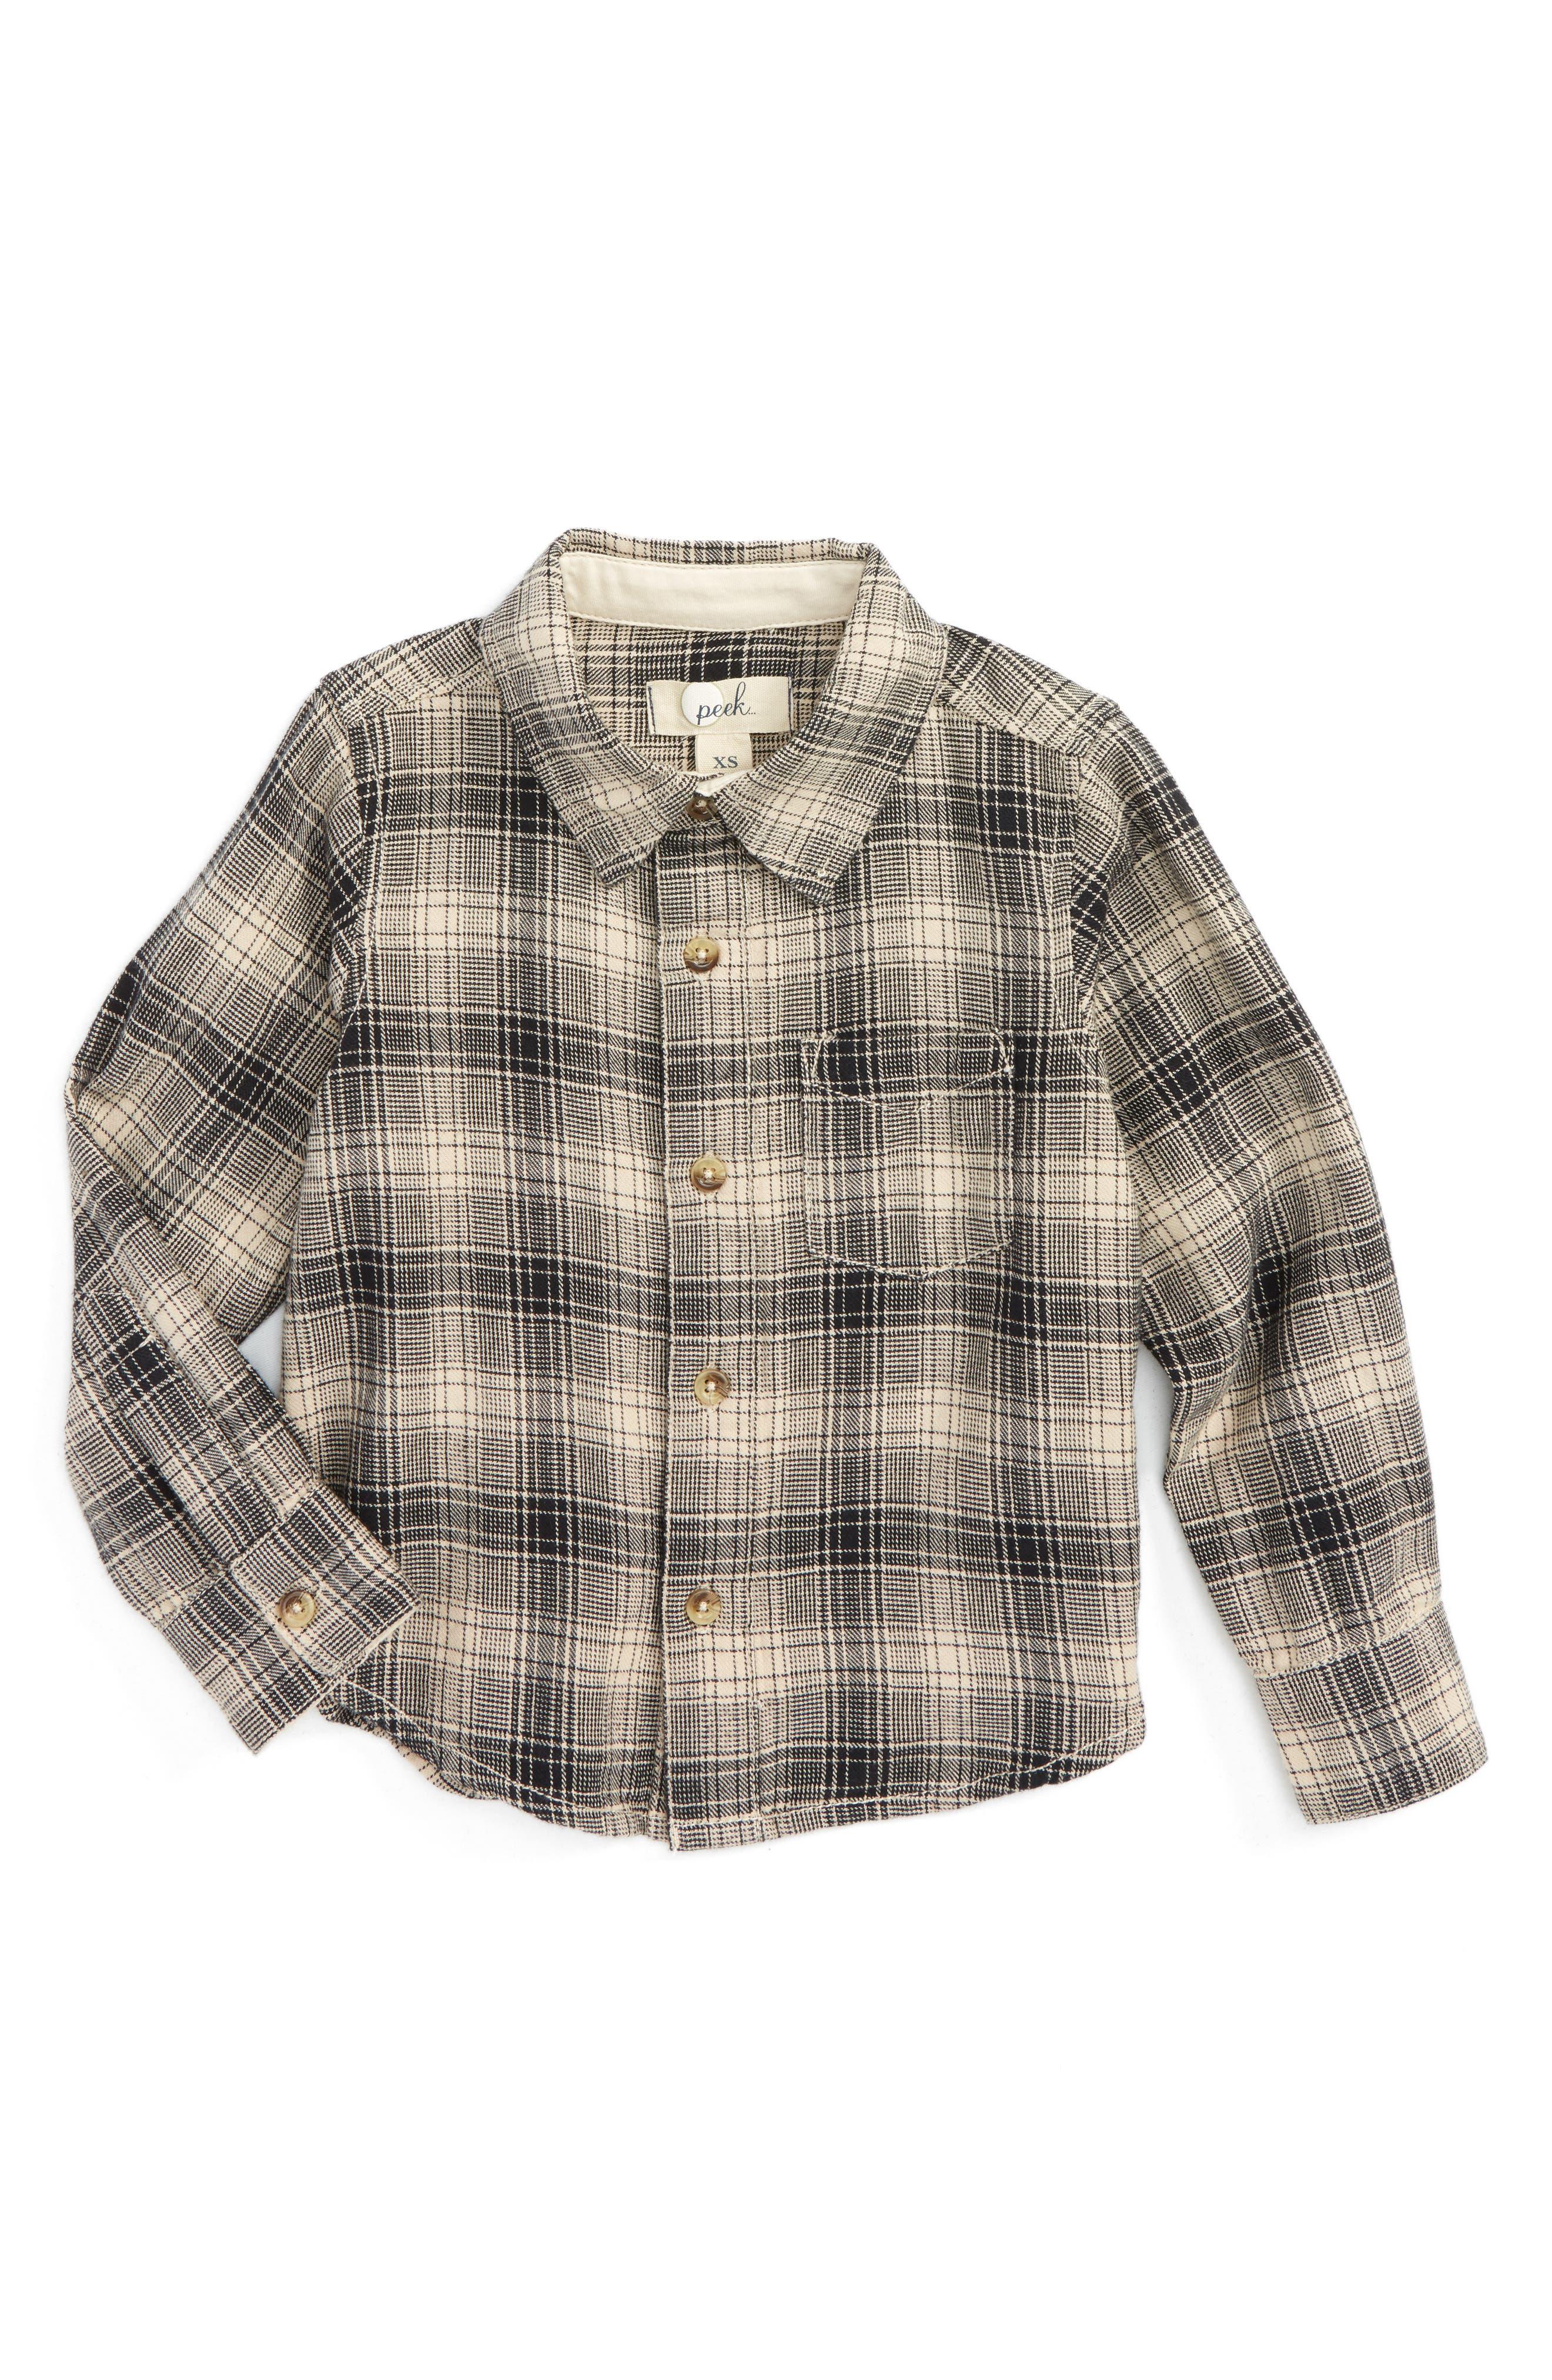 Peek Mase Plaid Shirt (Toddler Boys, Little Boys & Big Boys)